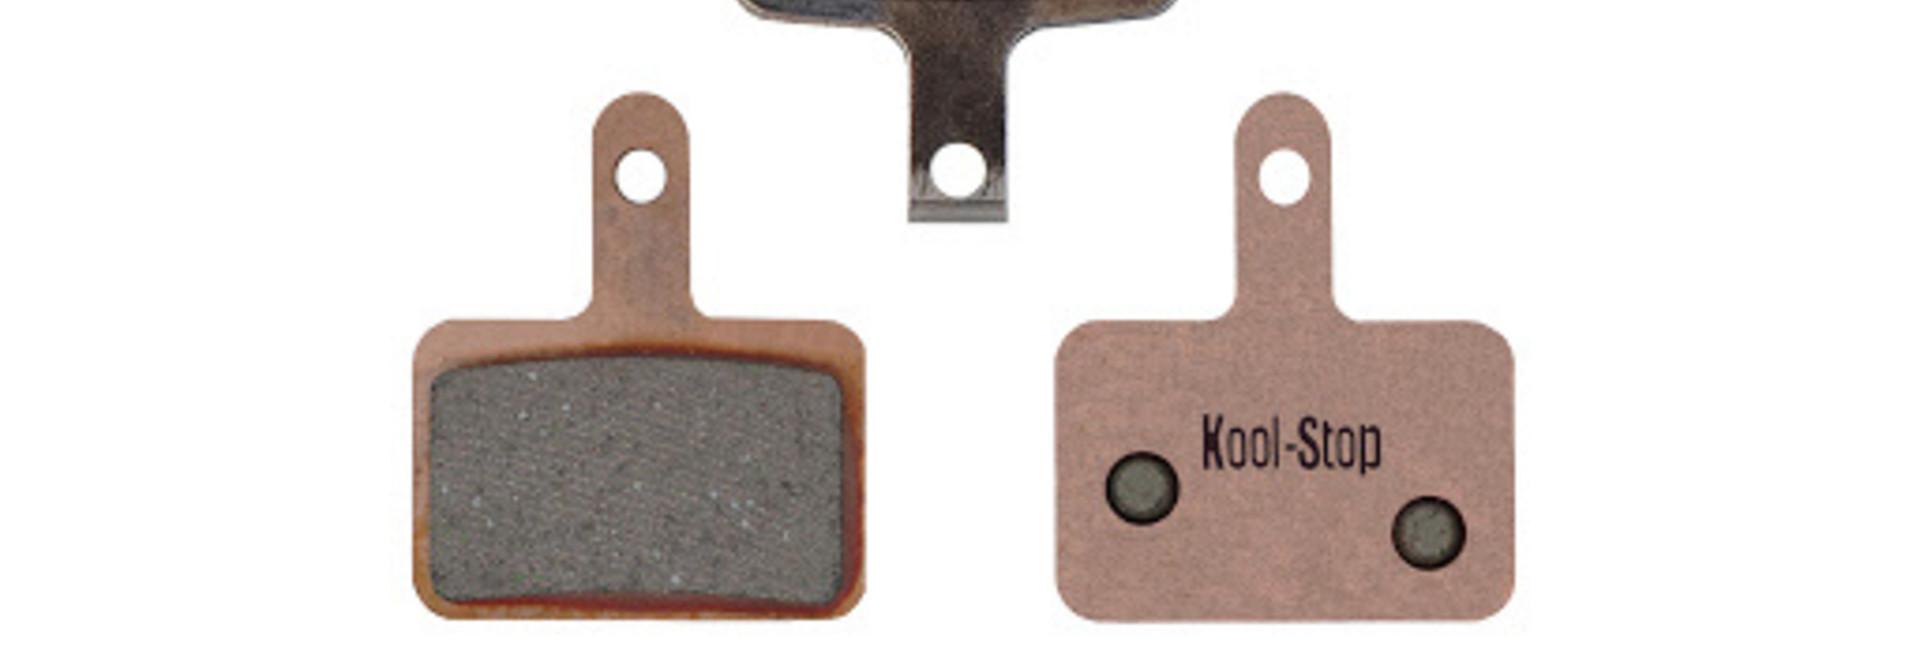 Kool-Stop Shimano Sintered M575/M495 Disc Brake Pads Copper Plate #KS-D620S